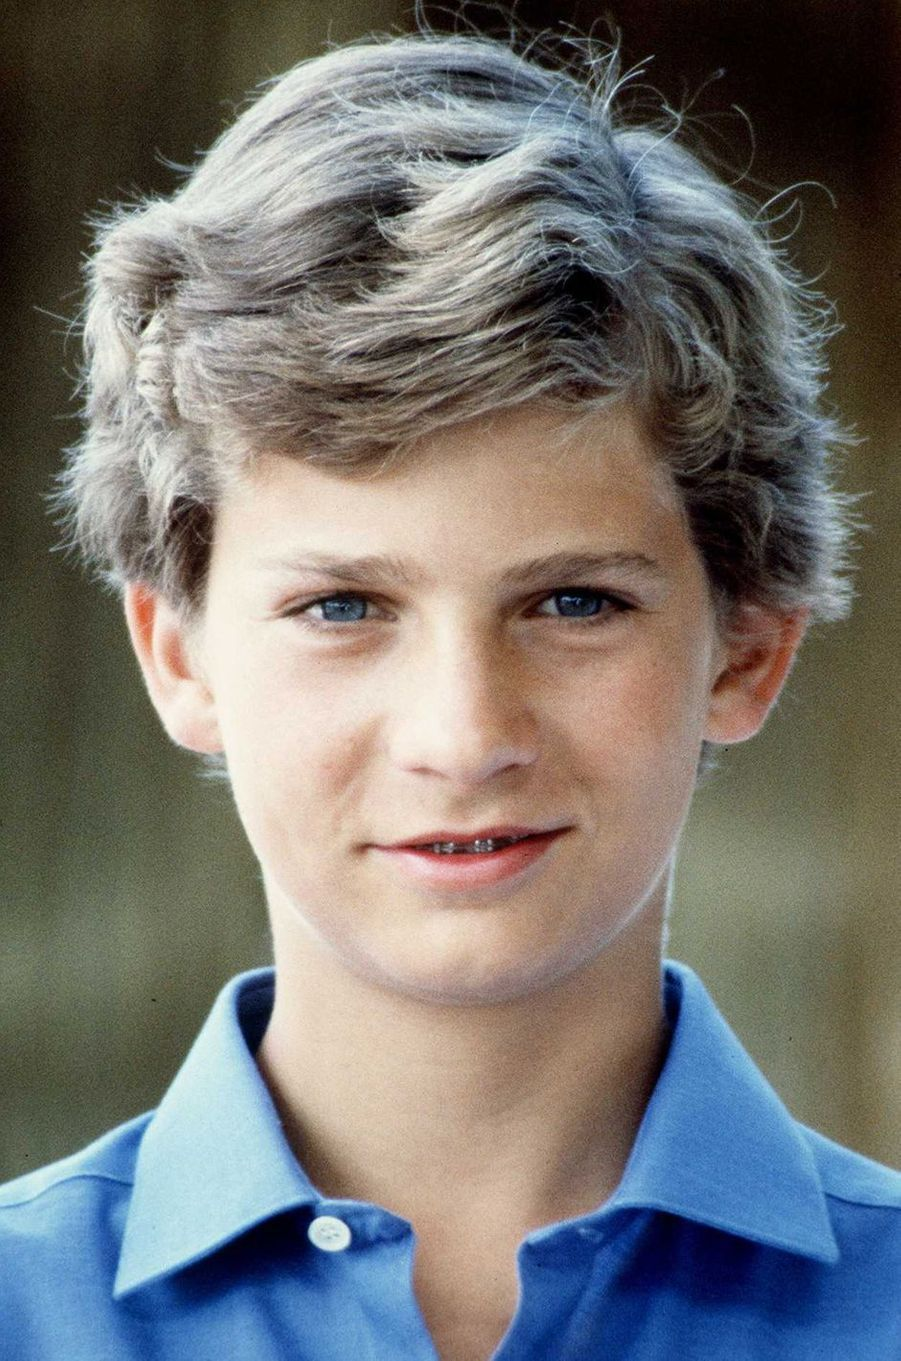 Le prince Felipe d'Espagne, le 5 août 1983